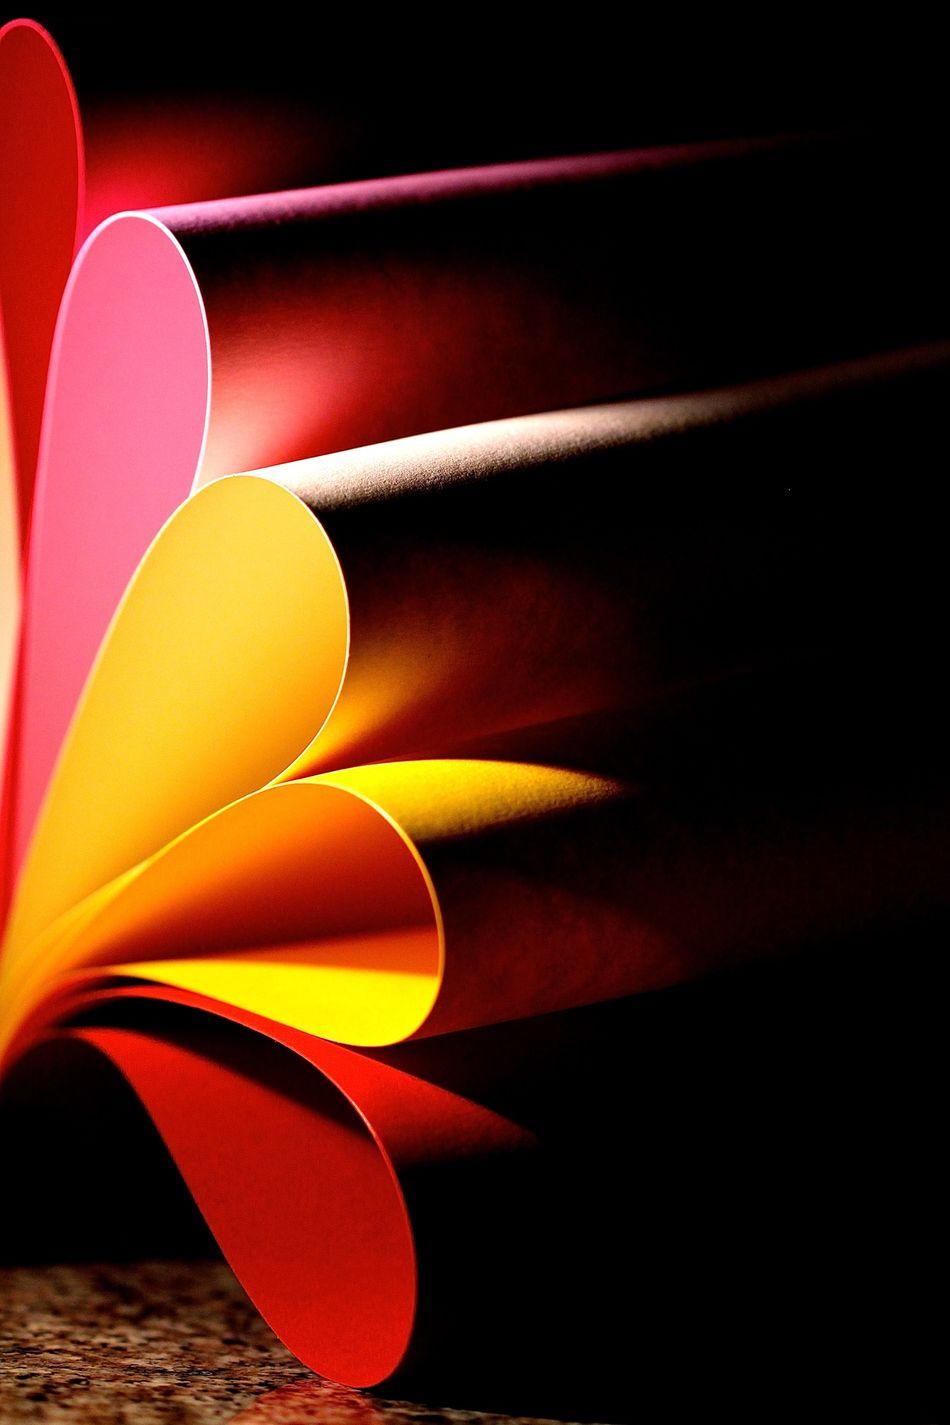 Beautiful stock photos of paper, Book, Close-Up, Concepts, Concepts & Topics